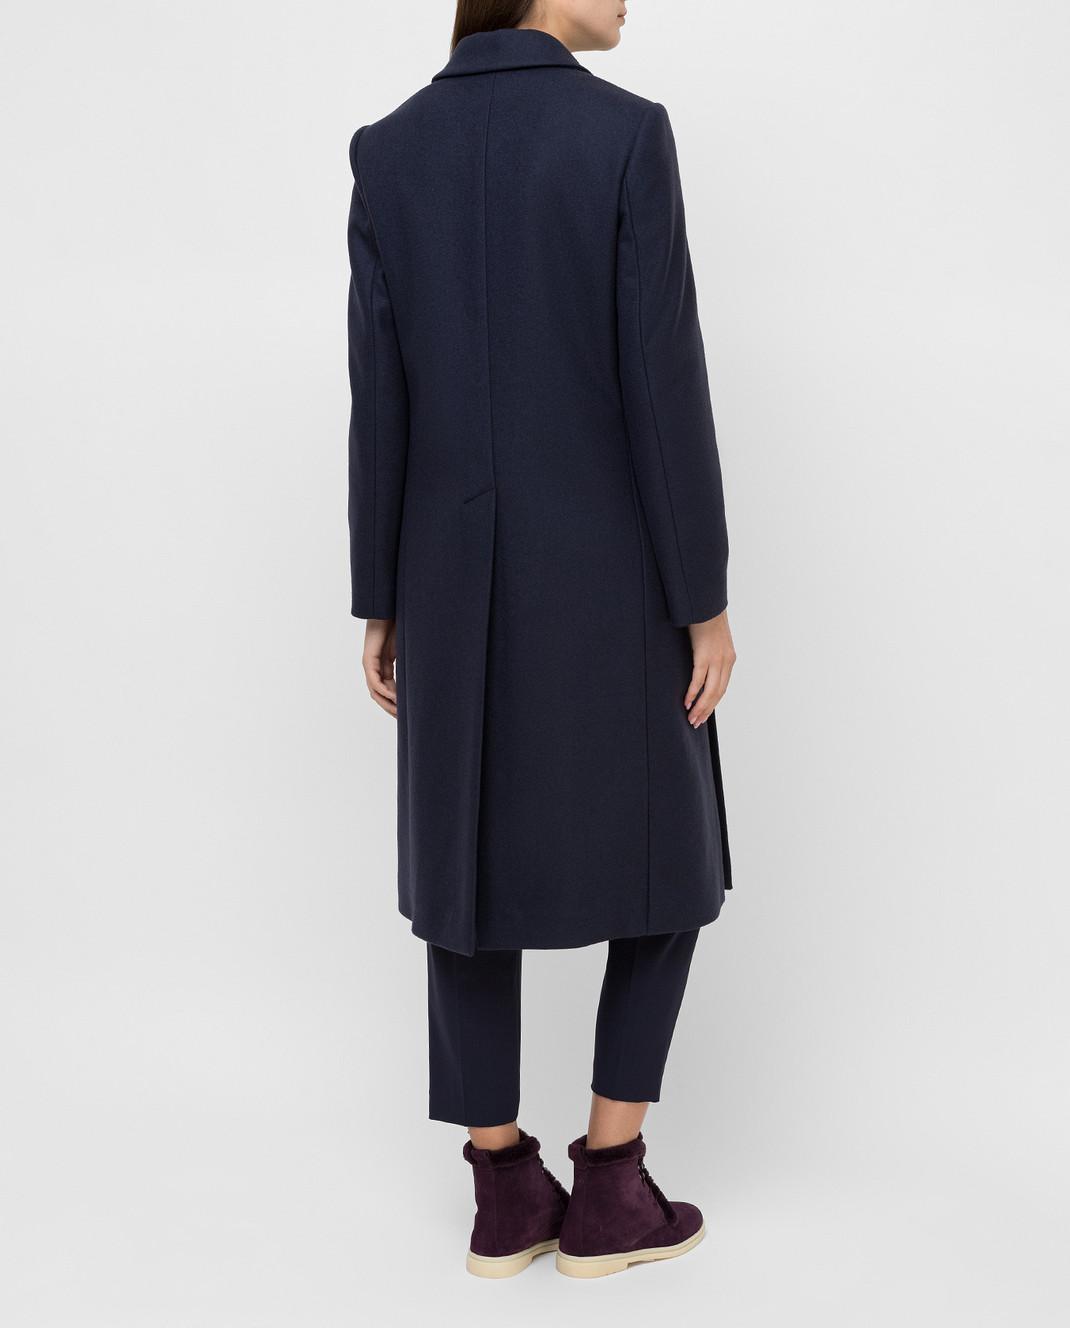 Brunello Cucinelli Темно-синее пальто из кашемира MA5324963 изображение 4